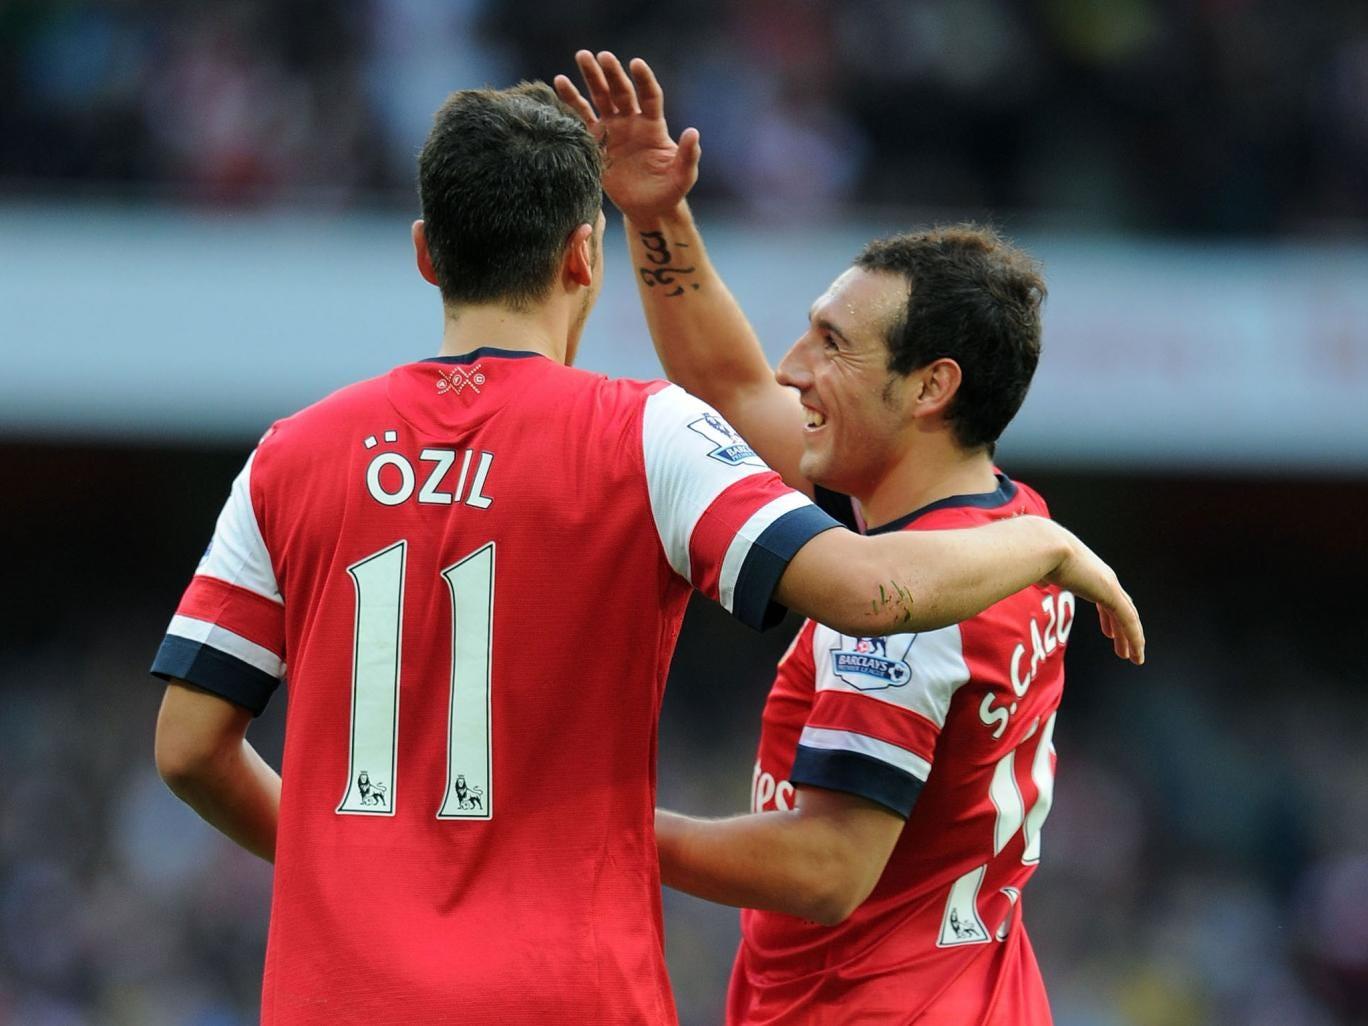 Mesut Ozil celebrates his second goal for Arsenal against Norwich City last month with Santi Cazorla